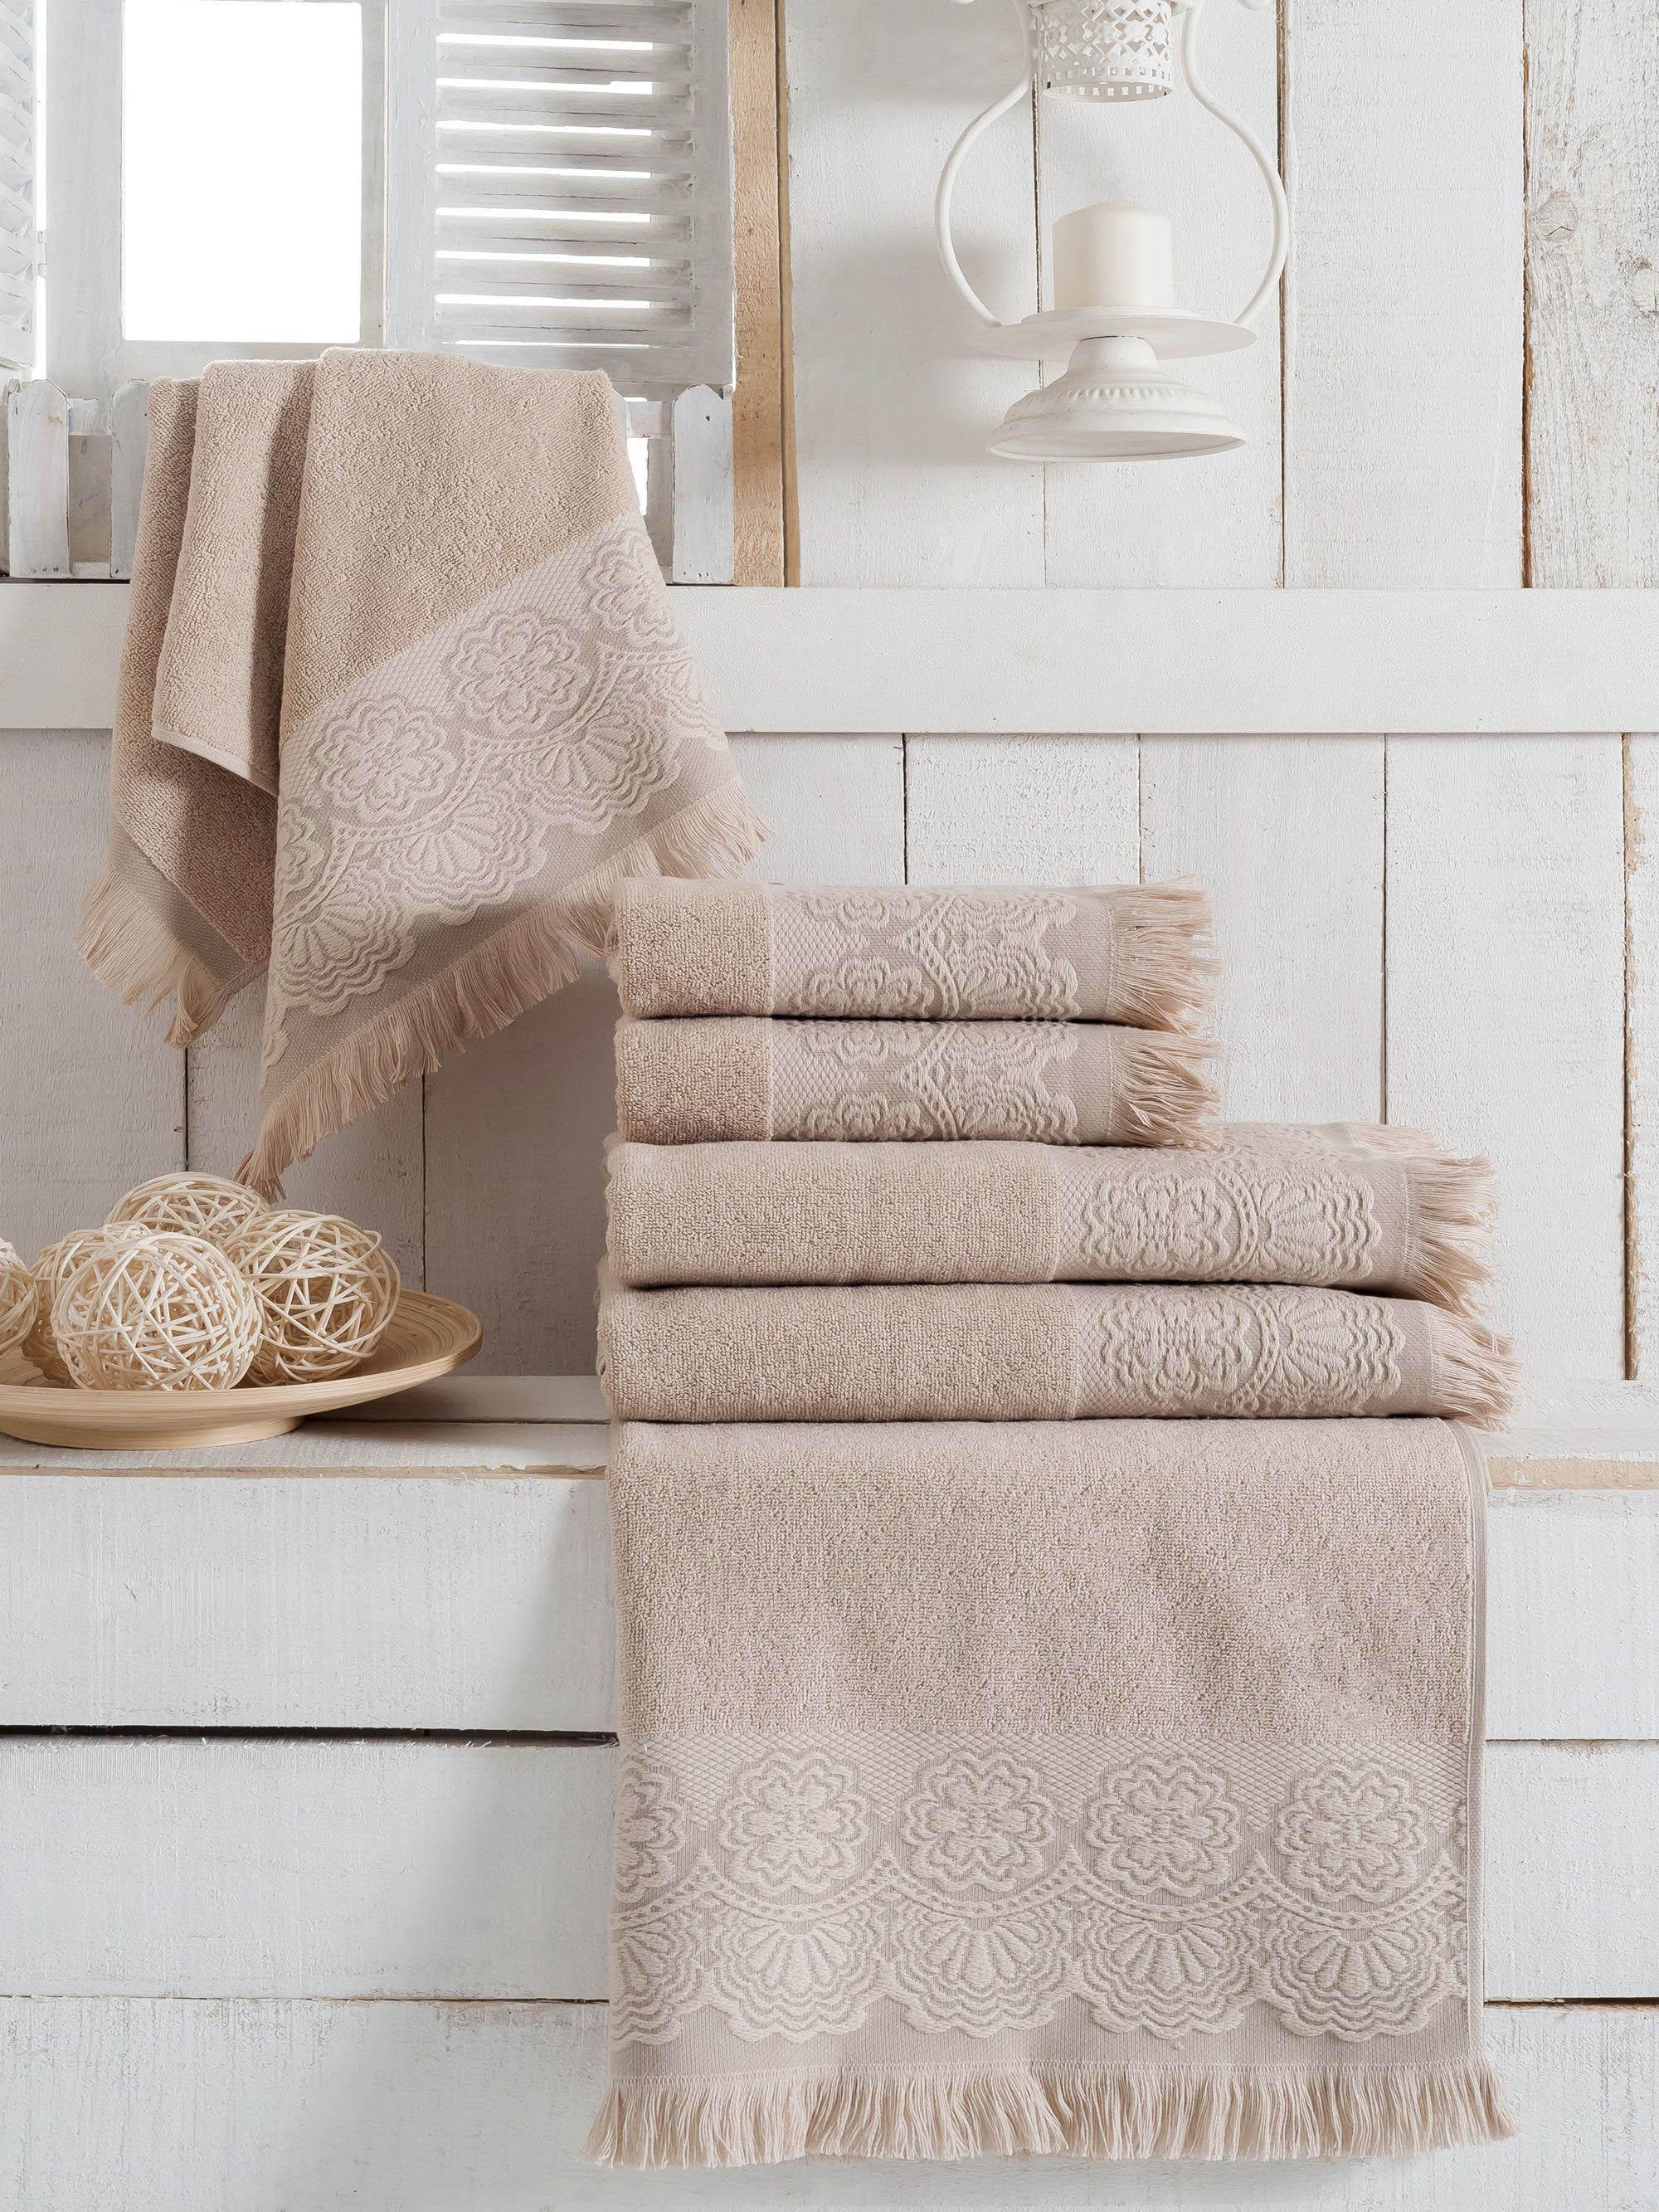 Полотенца Sokuculer Полотенце Zara Цвет: Молочный (70х140 см - 3 шт) полотенца банные spasilk полотенце 3 шт